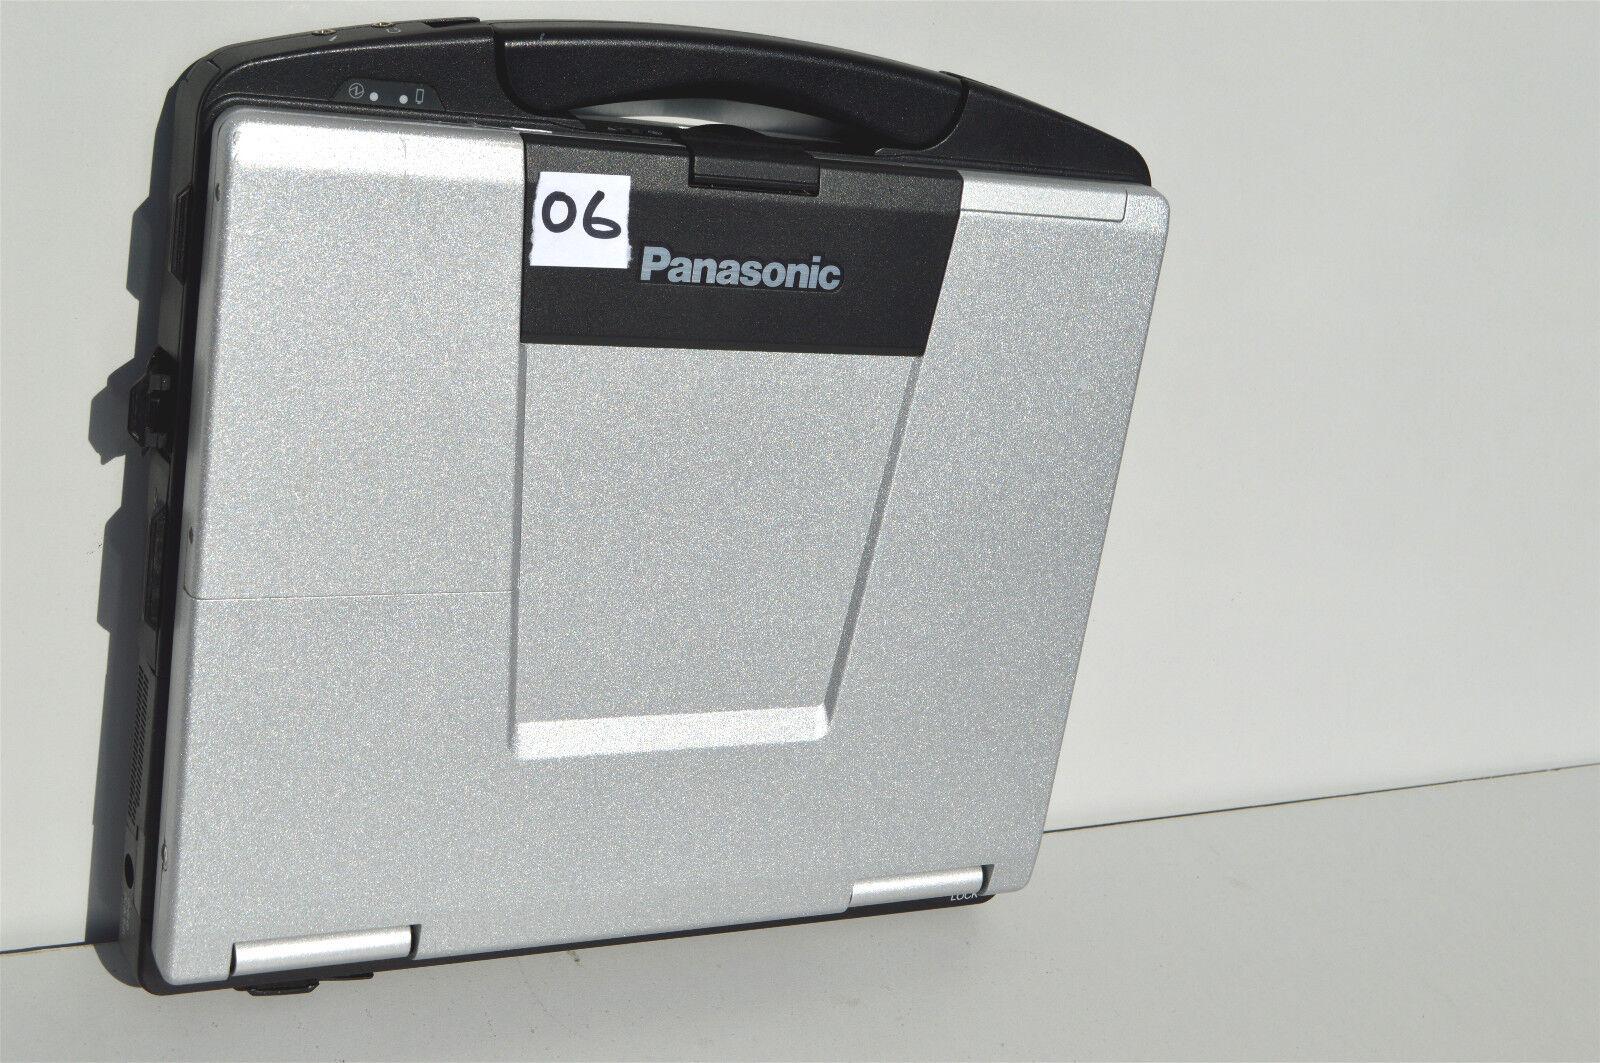 Panasonic Toughbook Cf-74 1.83ghz-2GHZ. 3gb RAM. 160SSD / Win 7  PRO/WIFI/